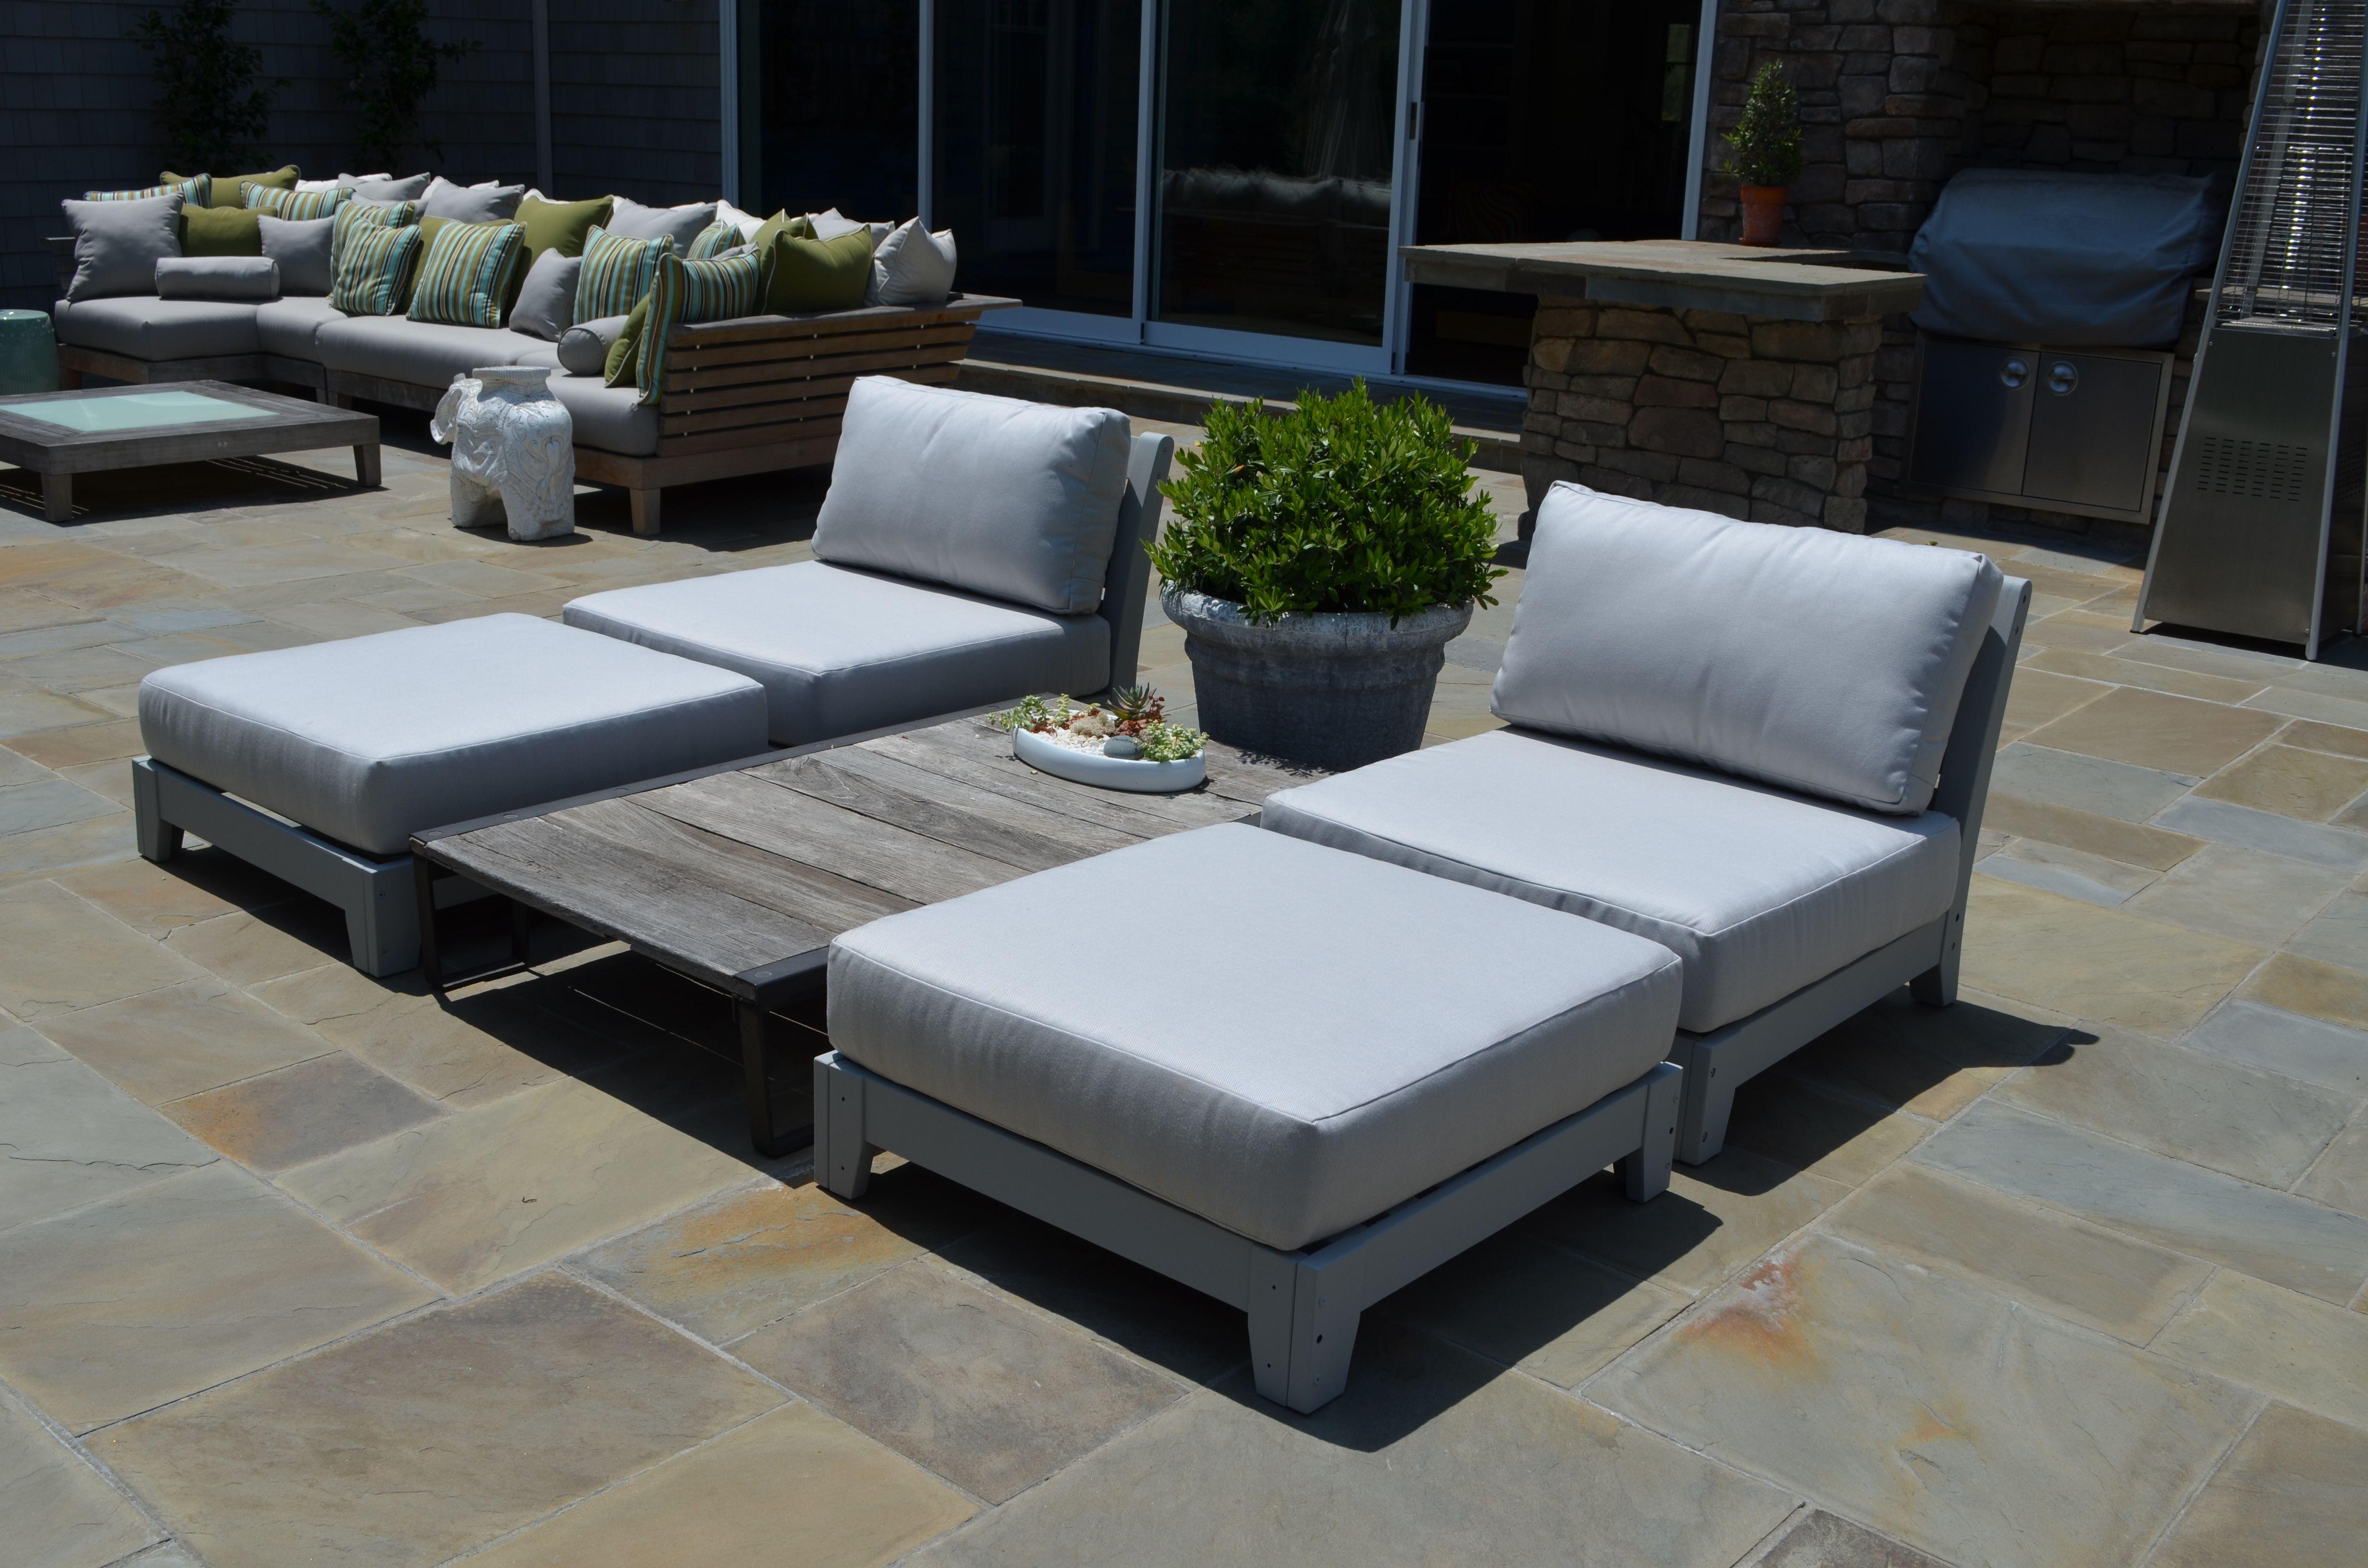 Custom Outdoor Cushions In Sunbrella Fabric And Dry Fast Foam